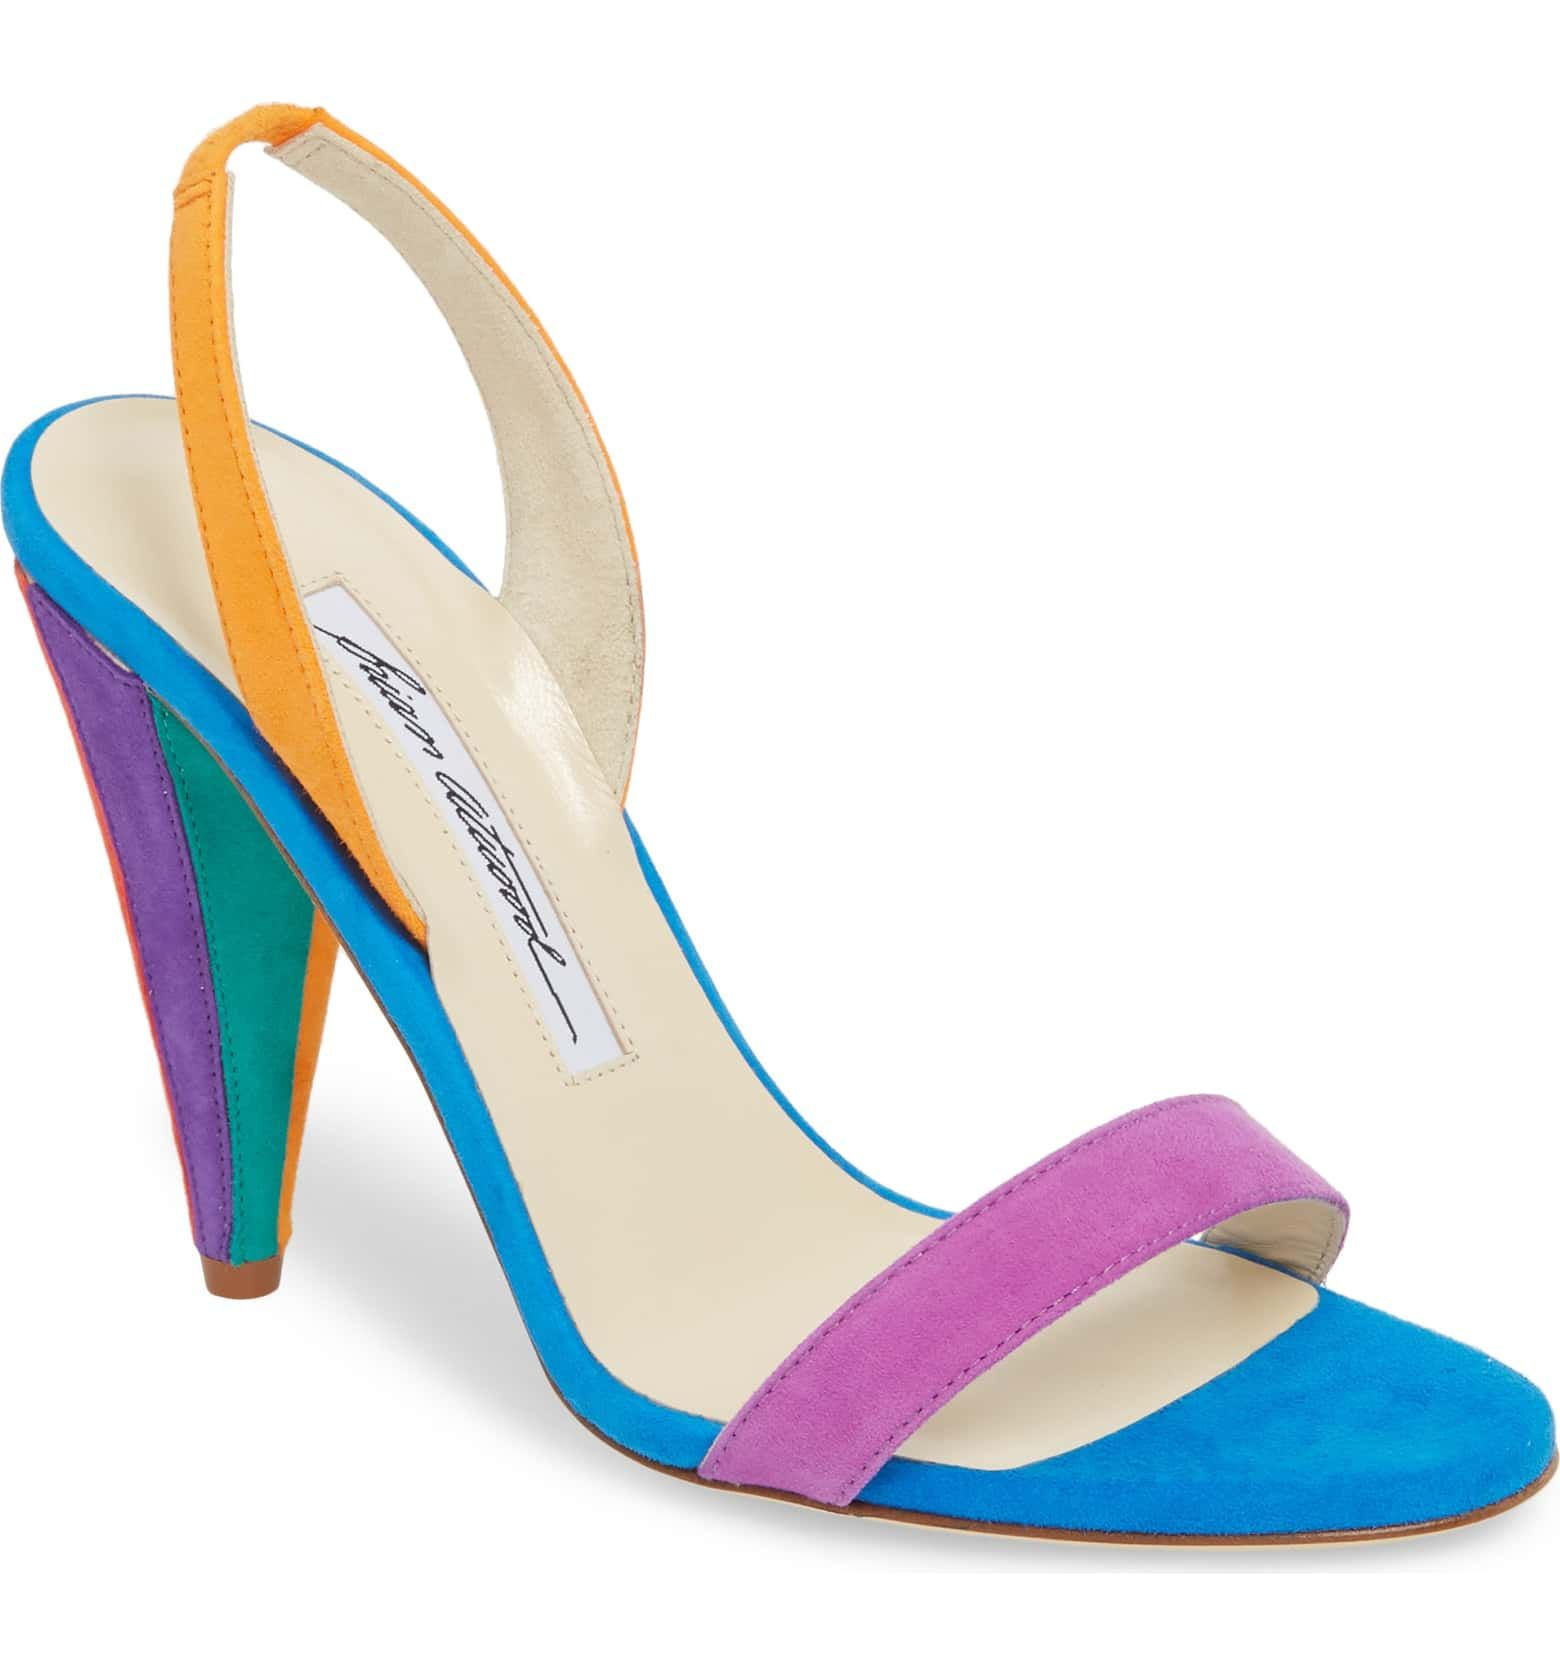 a965d4f5865 Susii Cone Heel Sandal, Main, color, Multi Color | Shoes | Heels ...